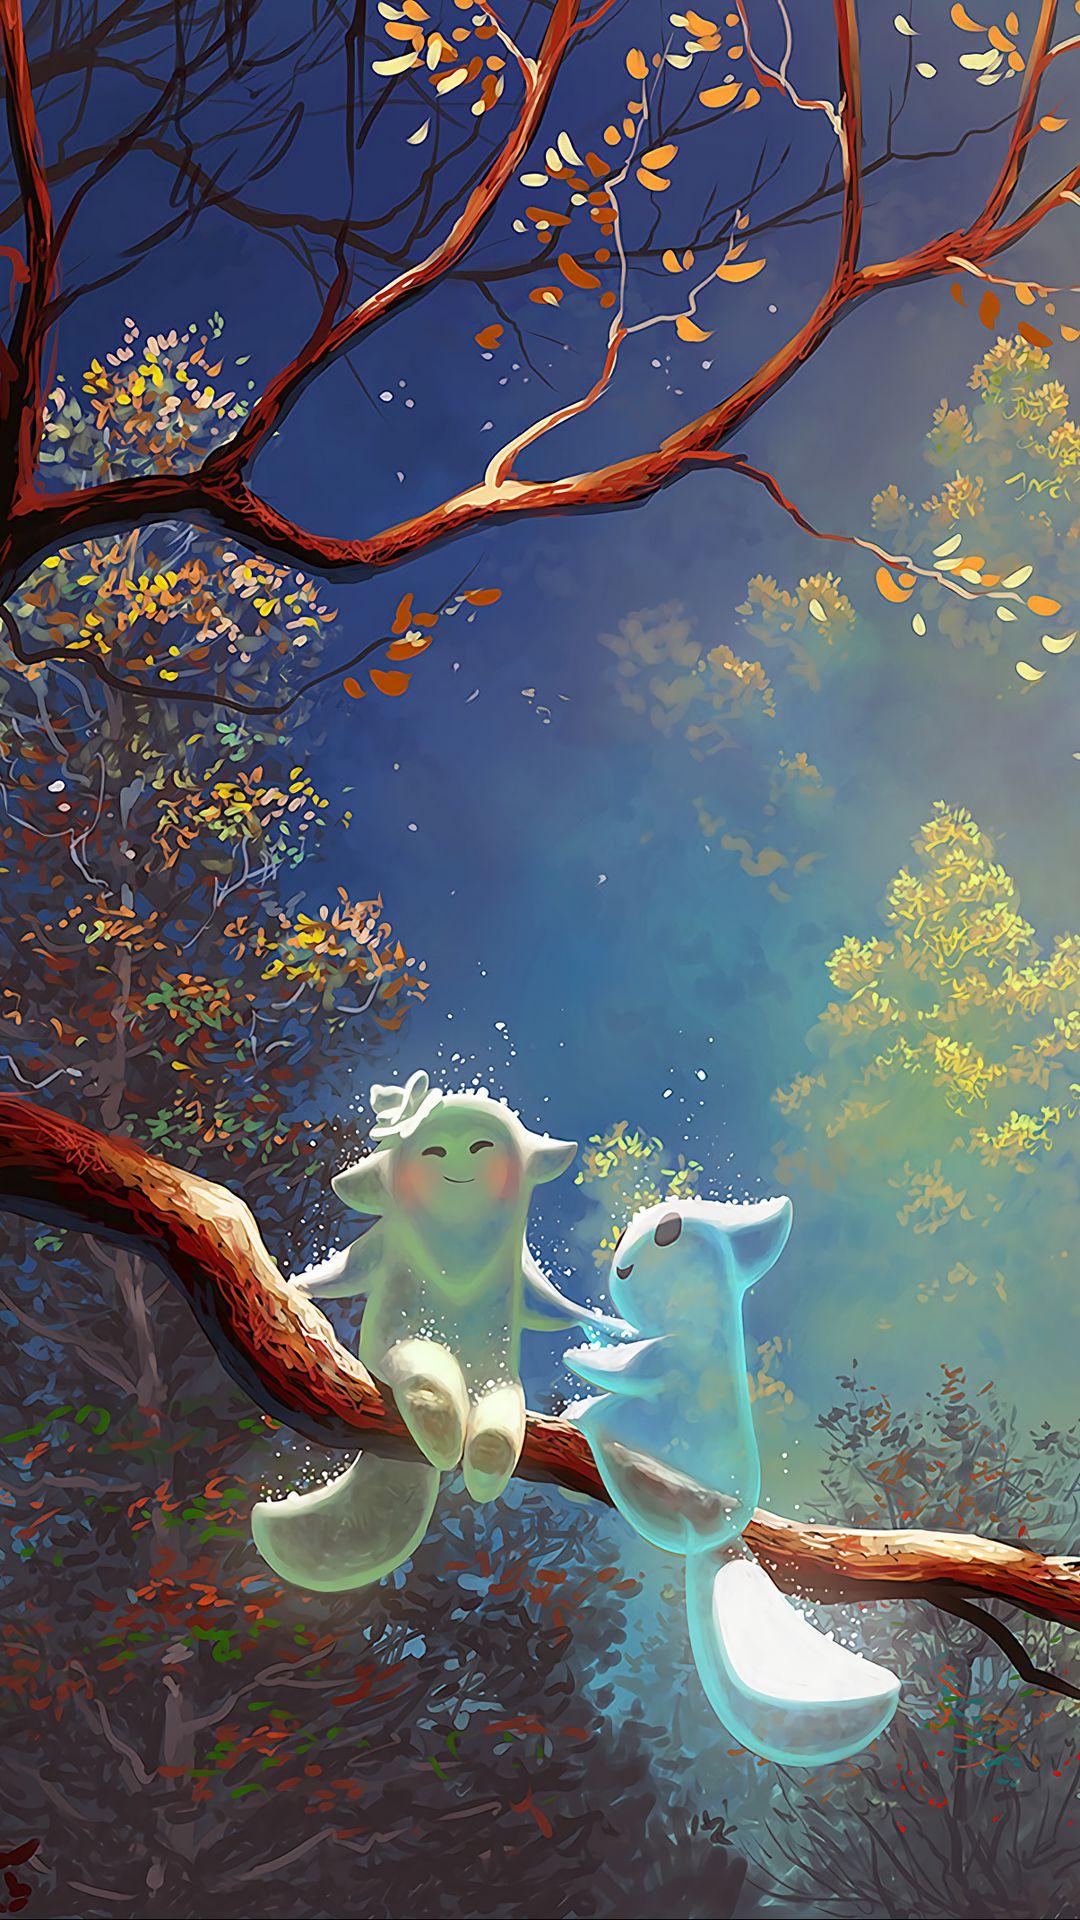 1080x1920 Wallpaper animals, tree, branch, magic, art, fantasy